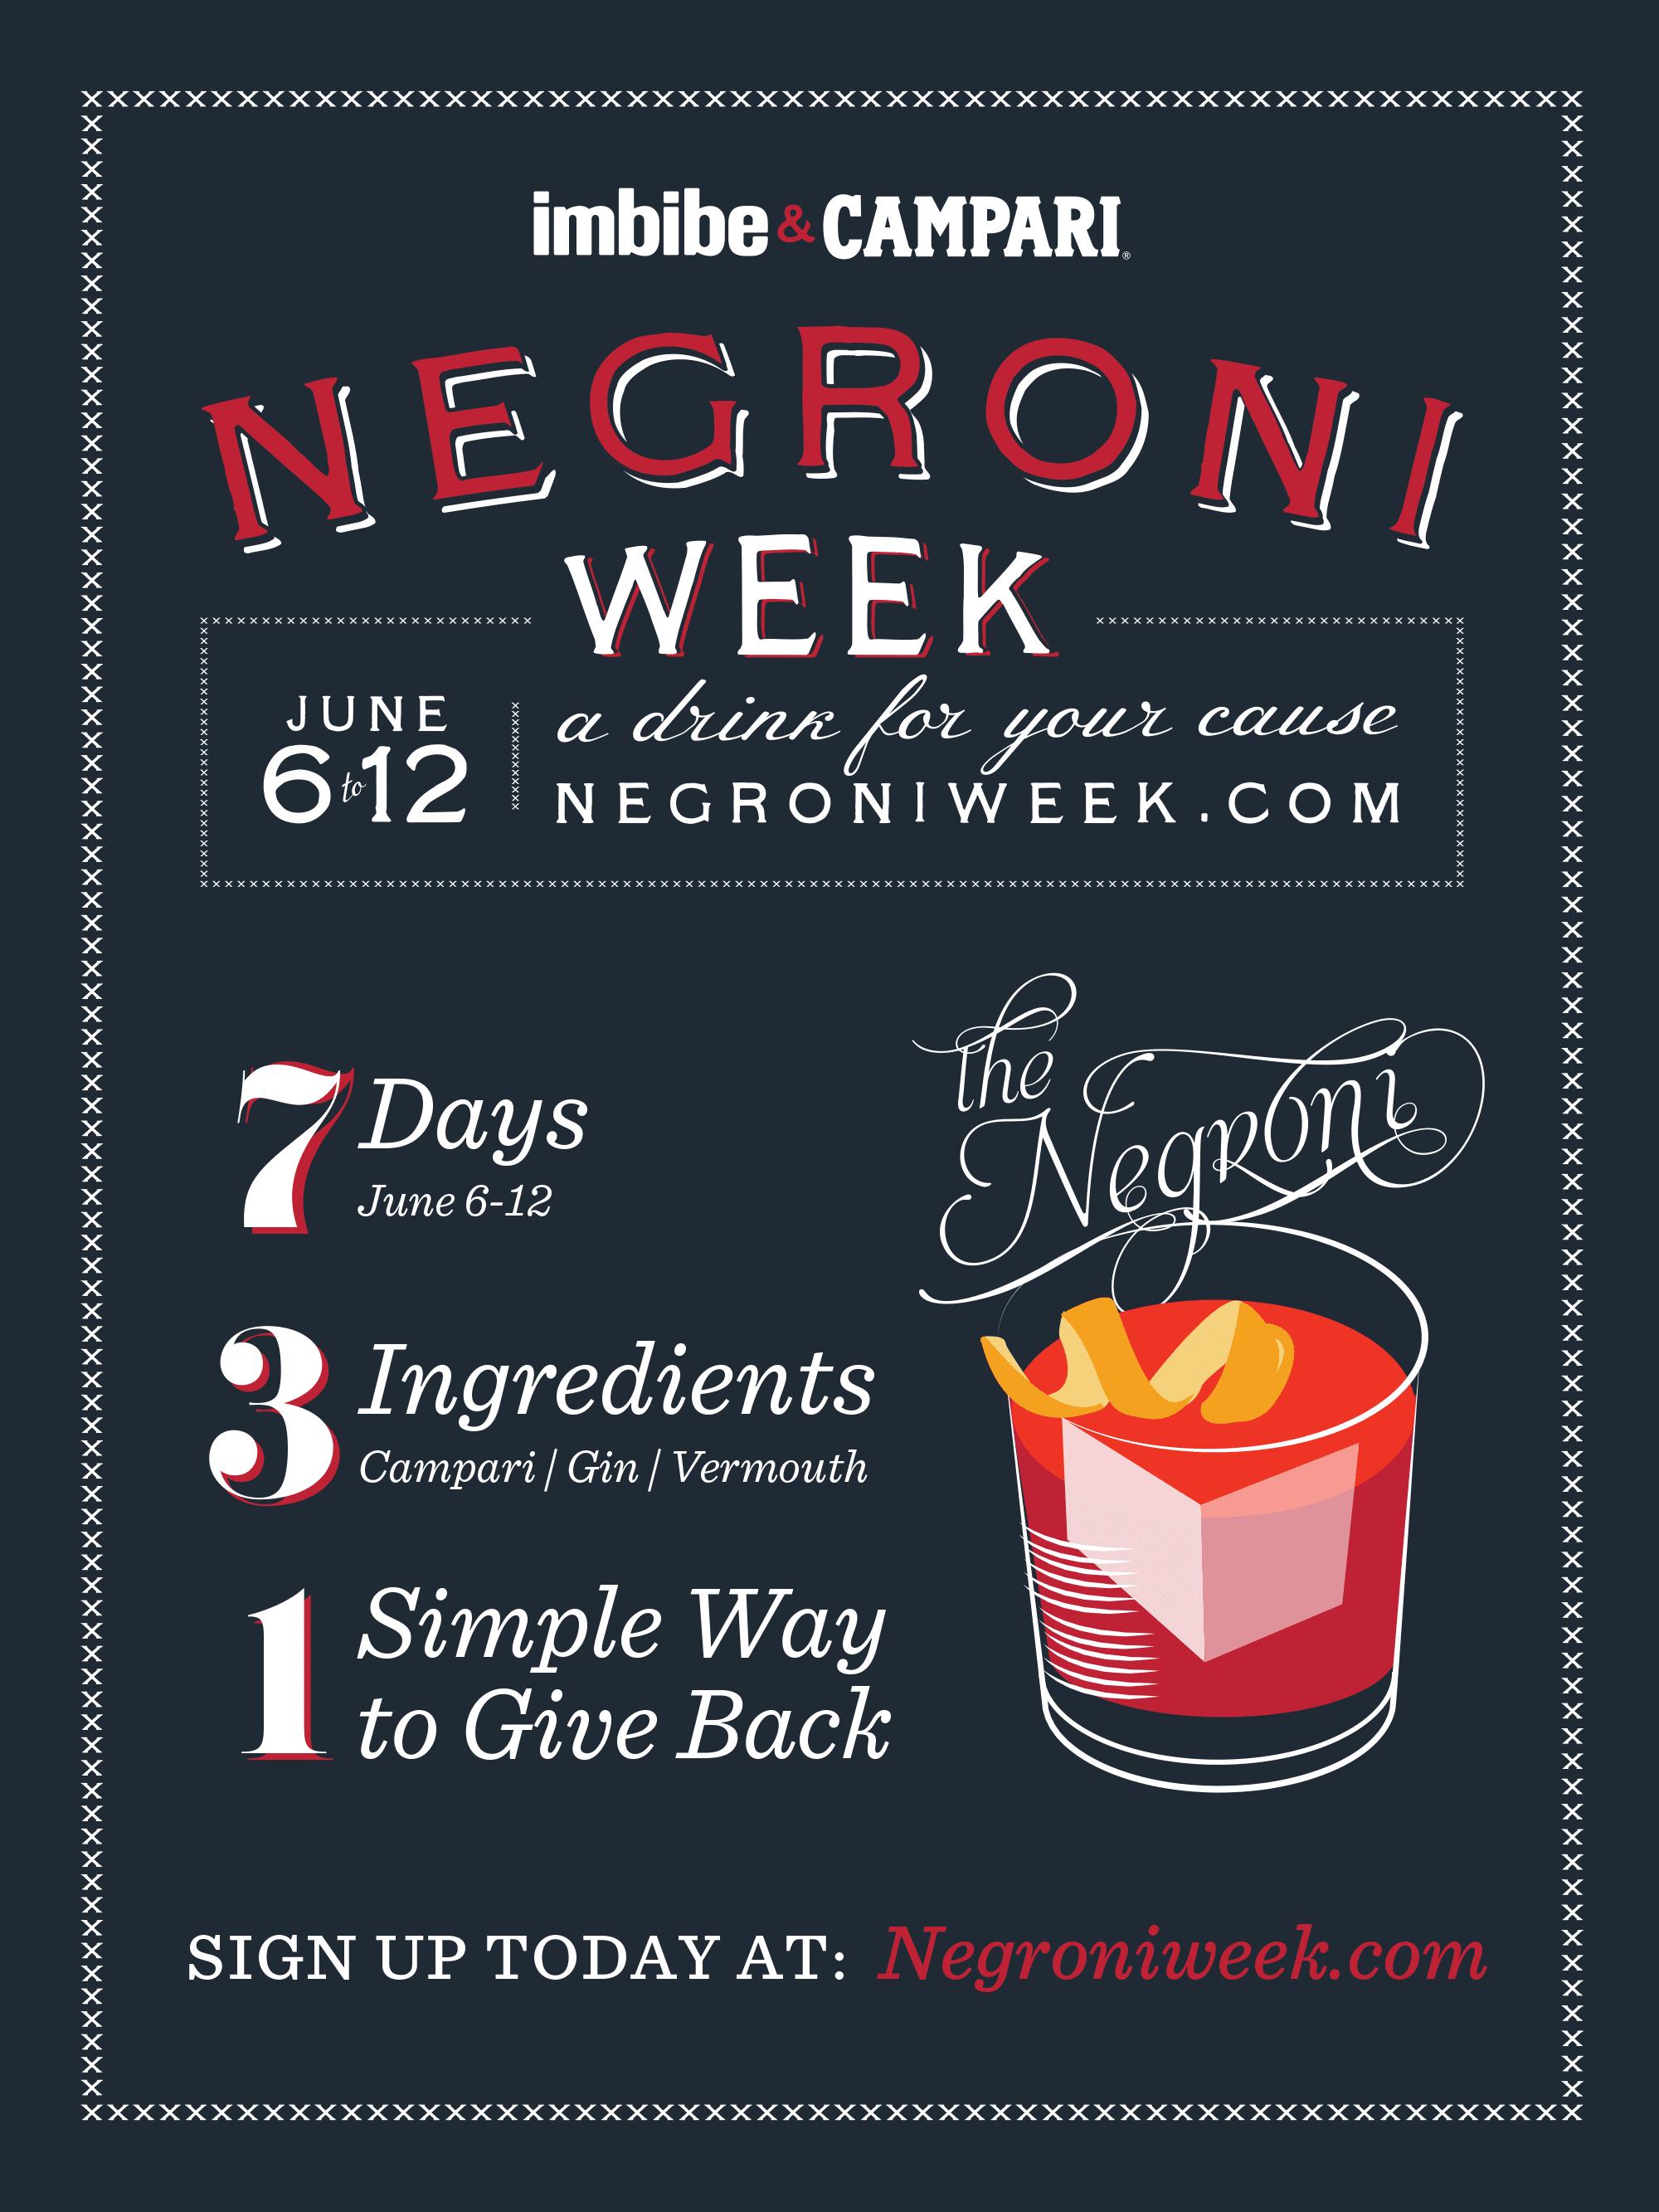 negroni week is here